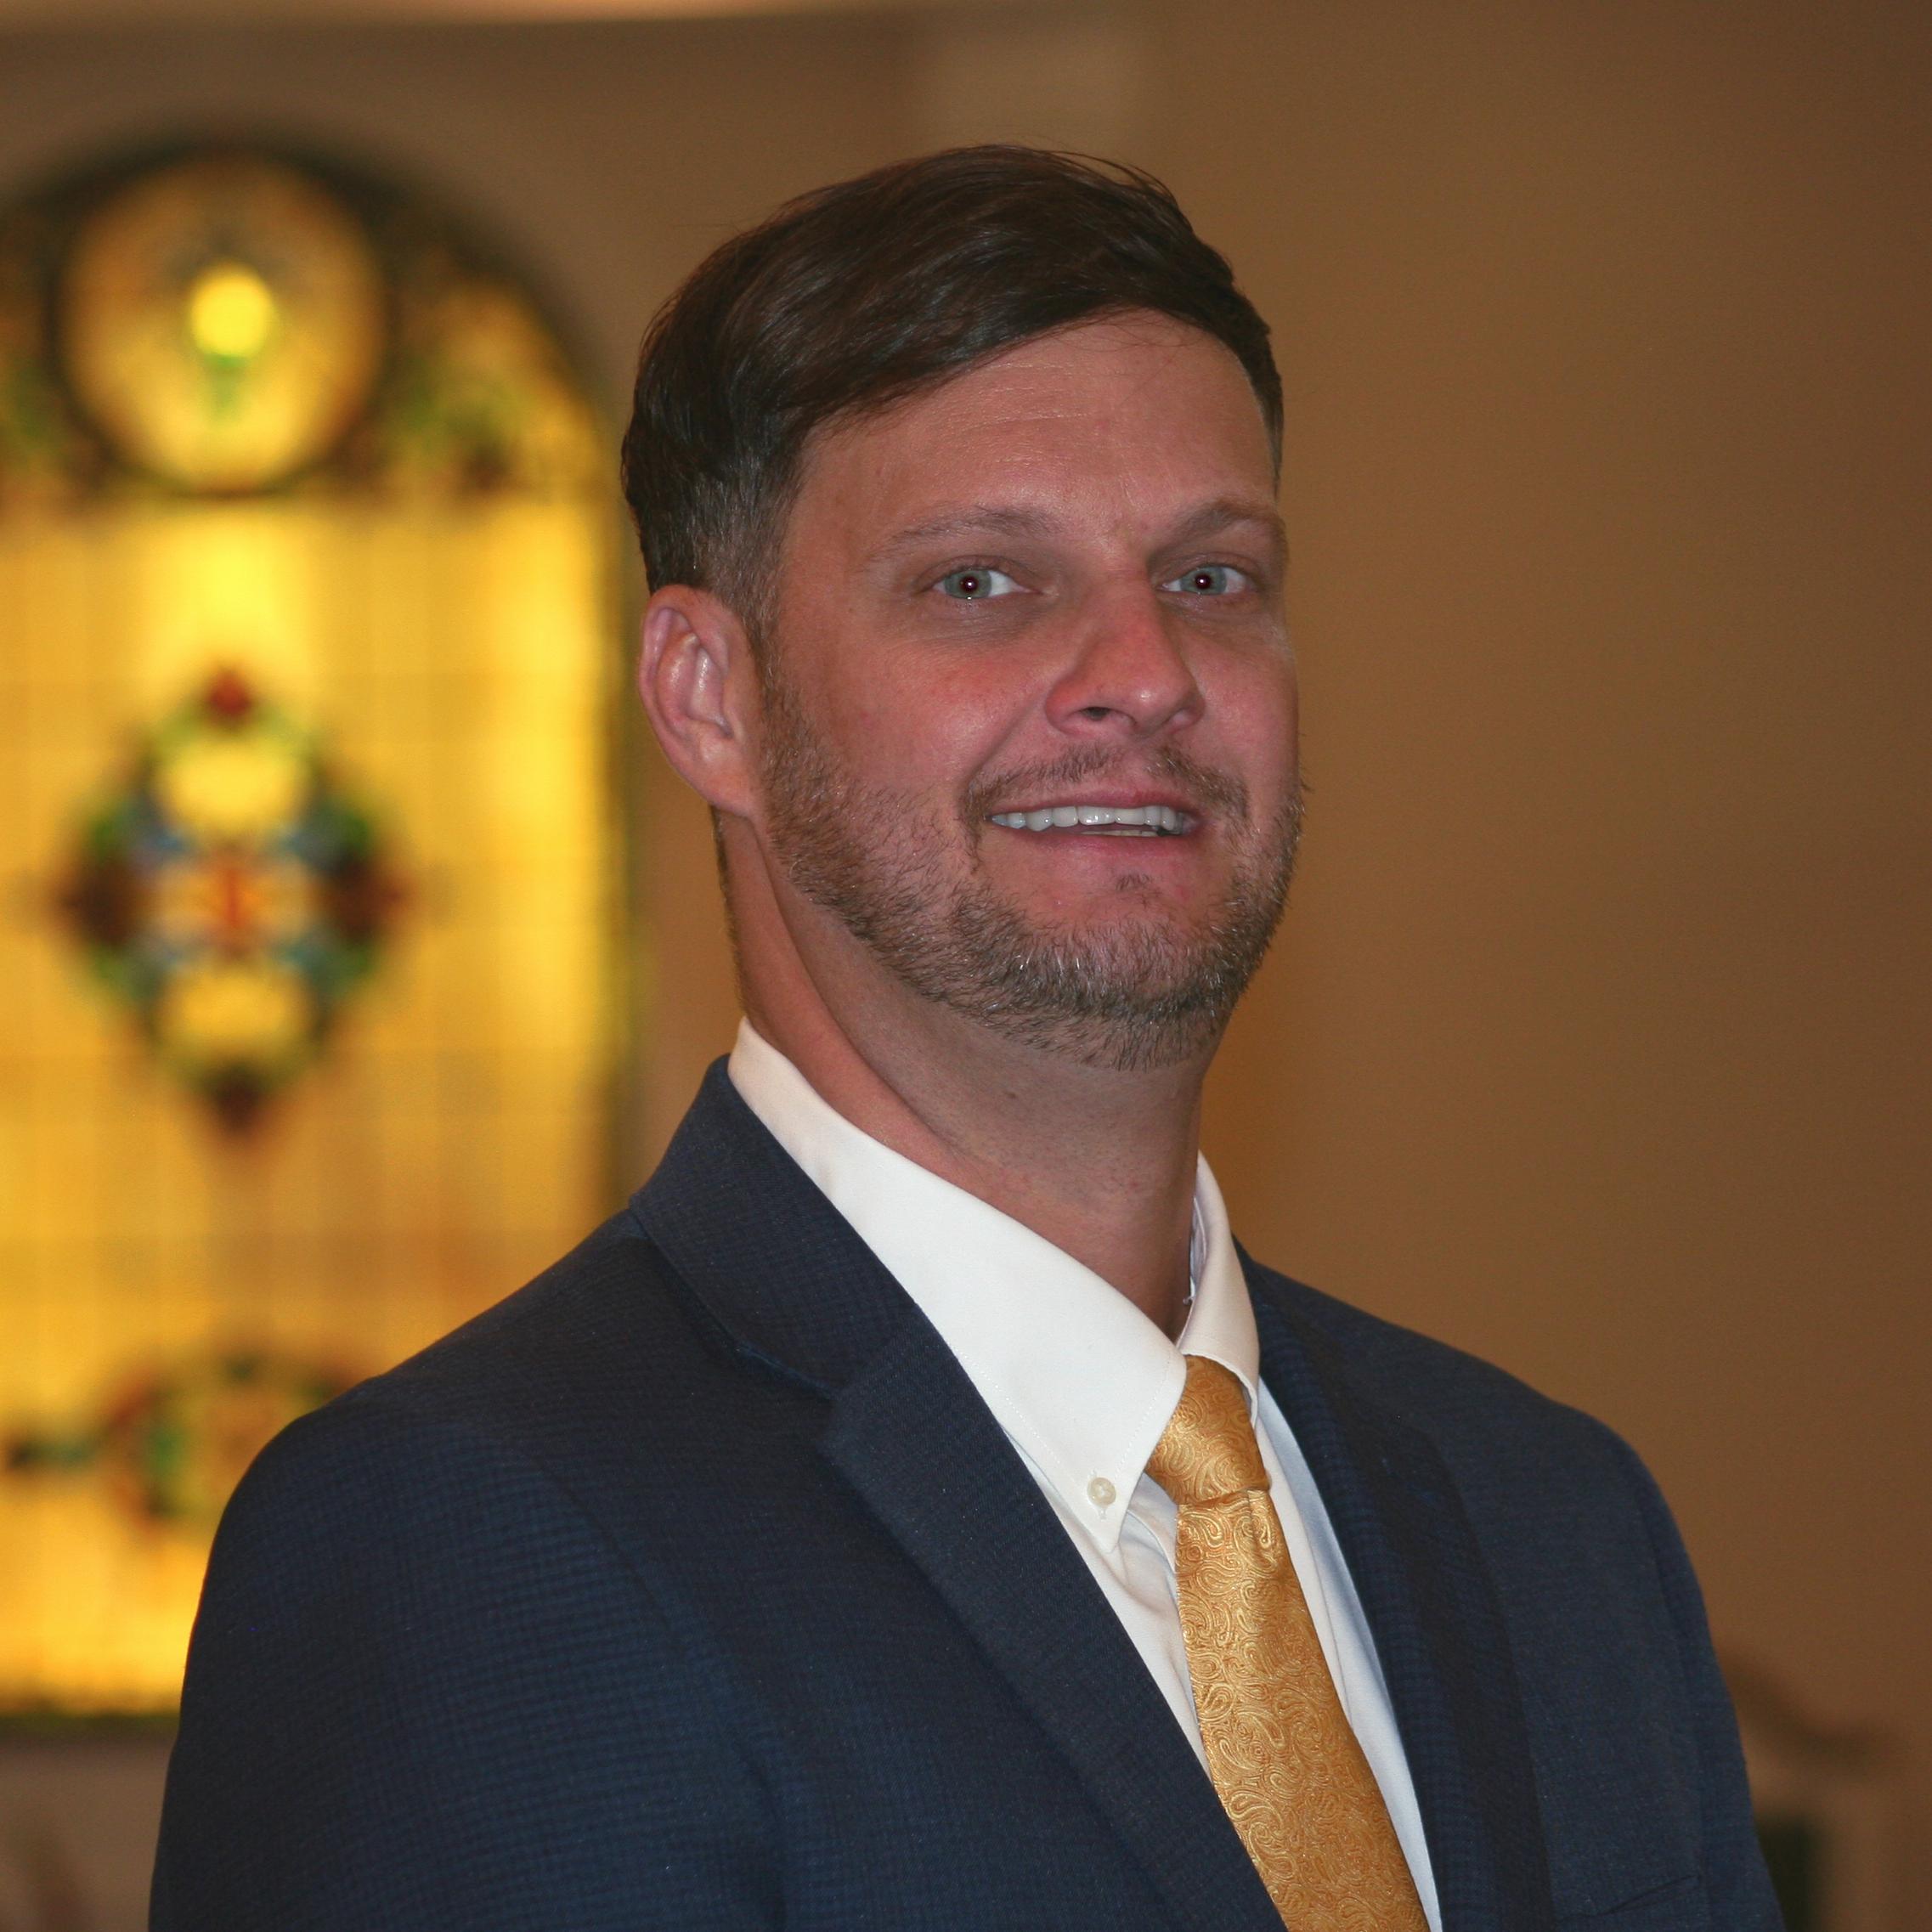 John Goddard : Funeral Director/Embalmer